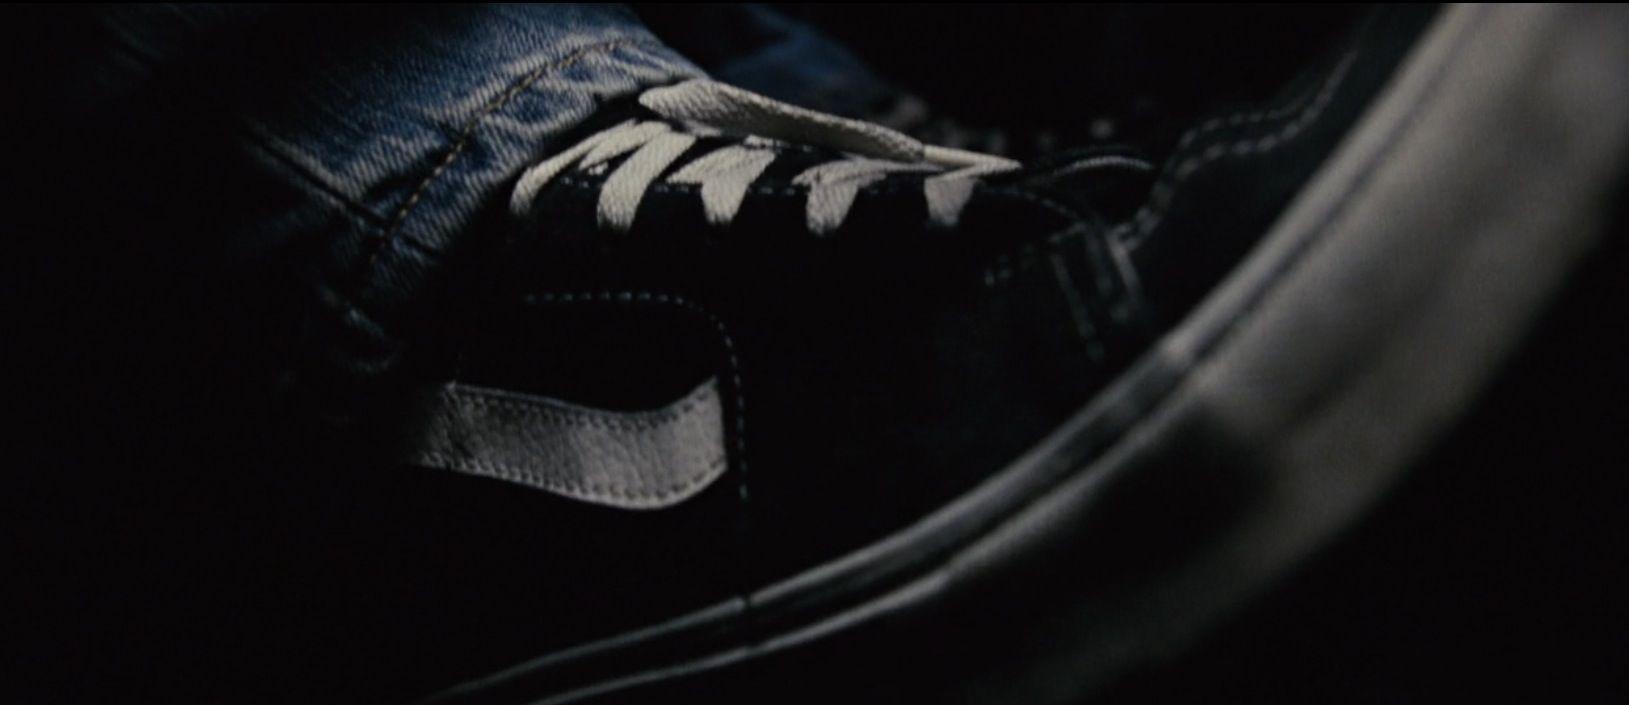 12338de761be Vans shoes worn by Paul Walker in FAST FIVE (2011)  vans ...